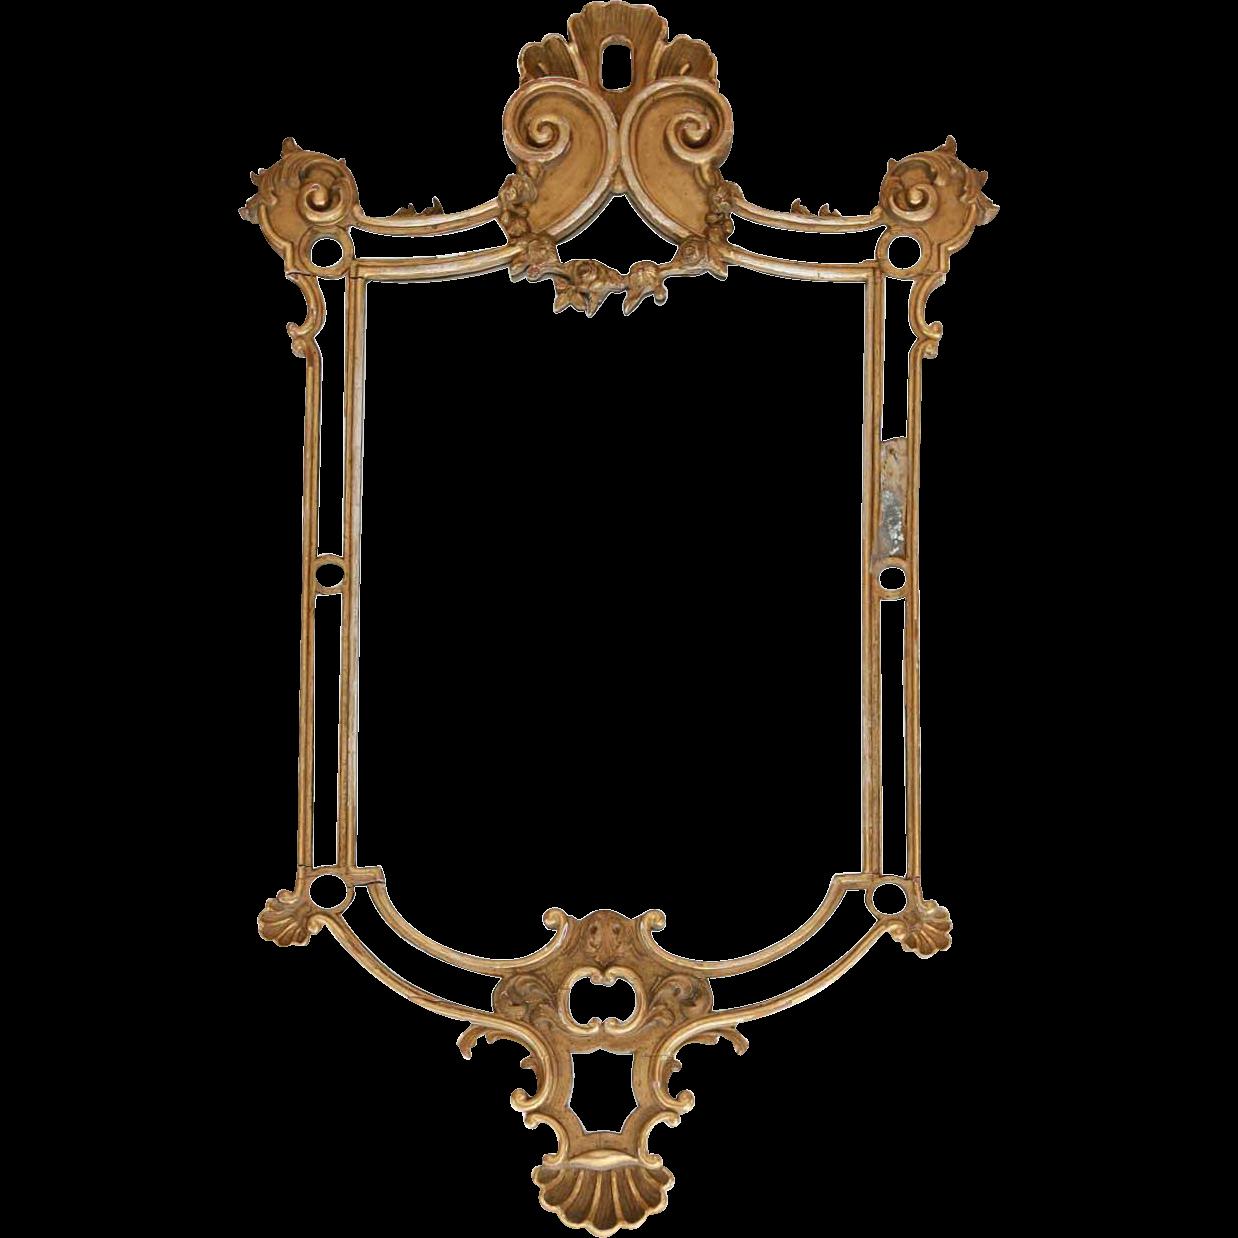 French Rococo Revival Gilt Pine Mirror